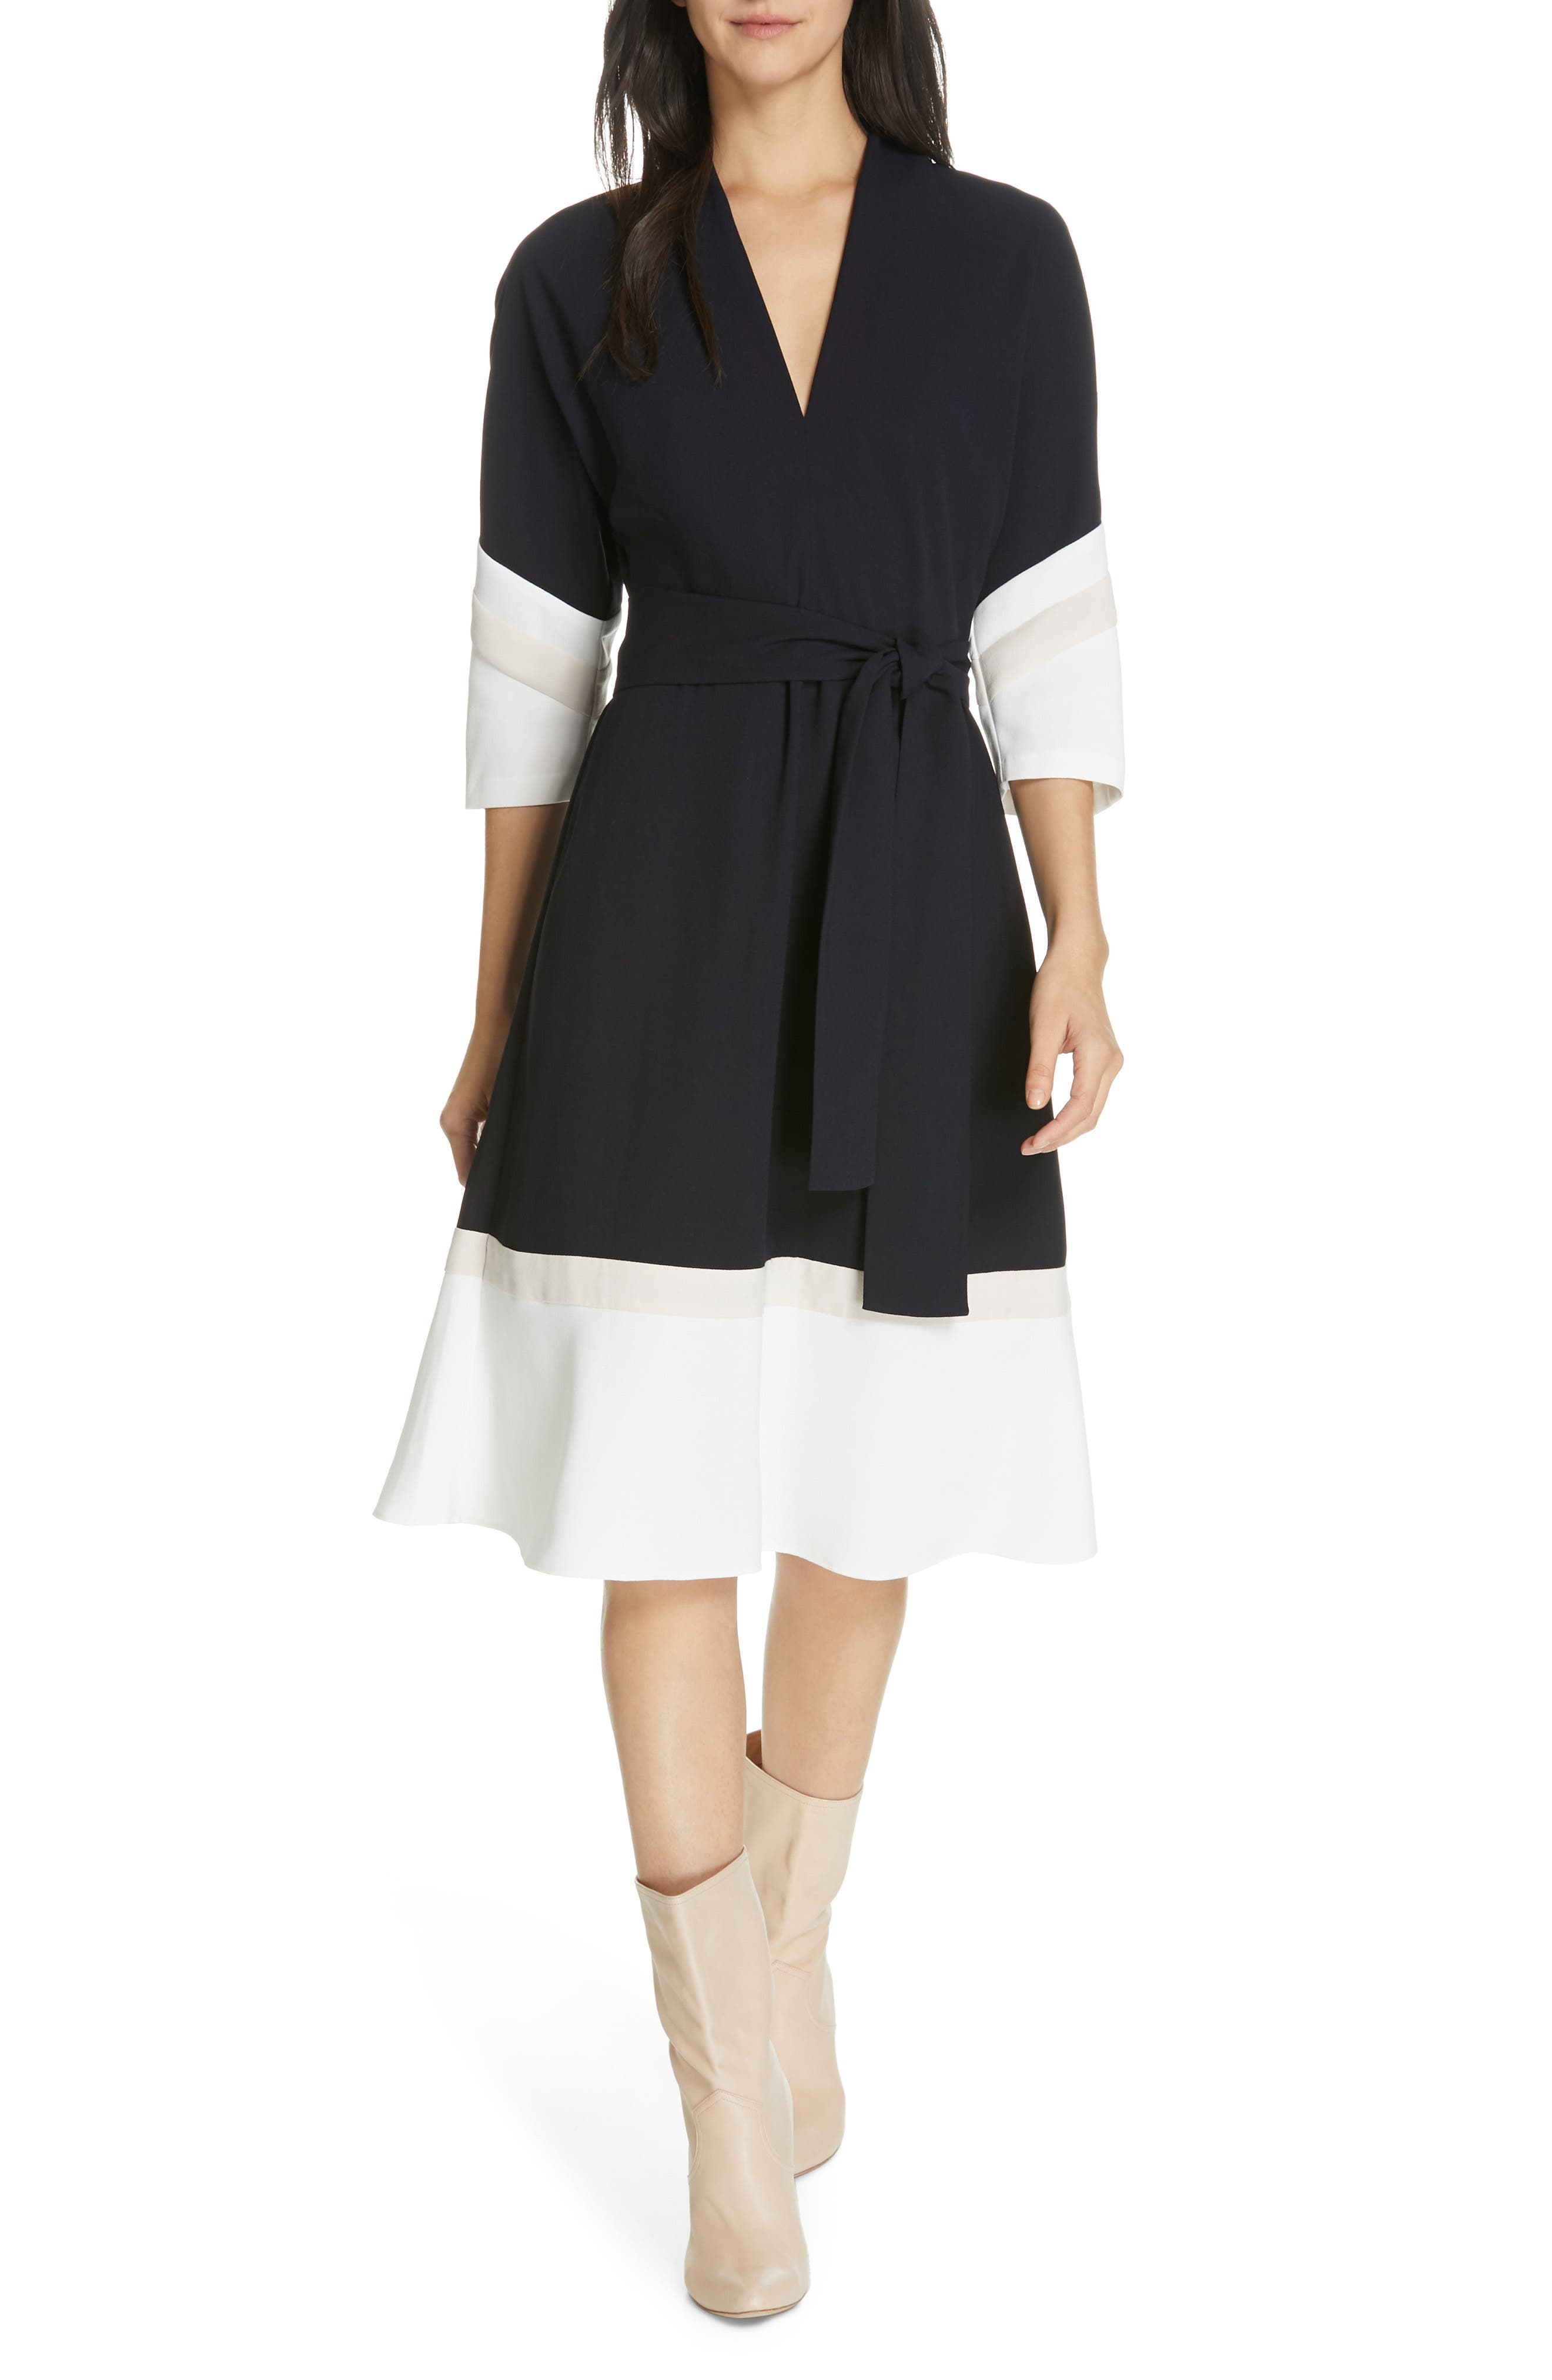 Aydrien Colorblock Dress,                             Main thumbnail 1, color,                             MID PORCELAIN-PINK SKY